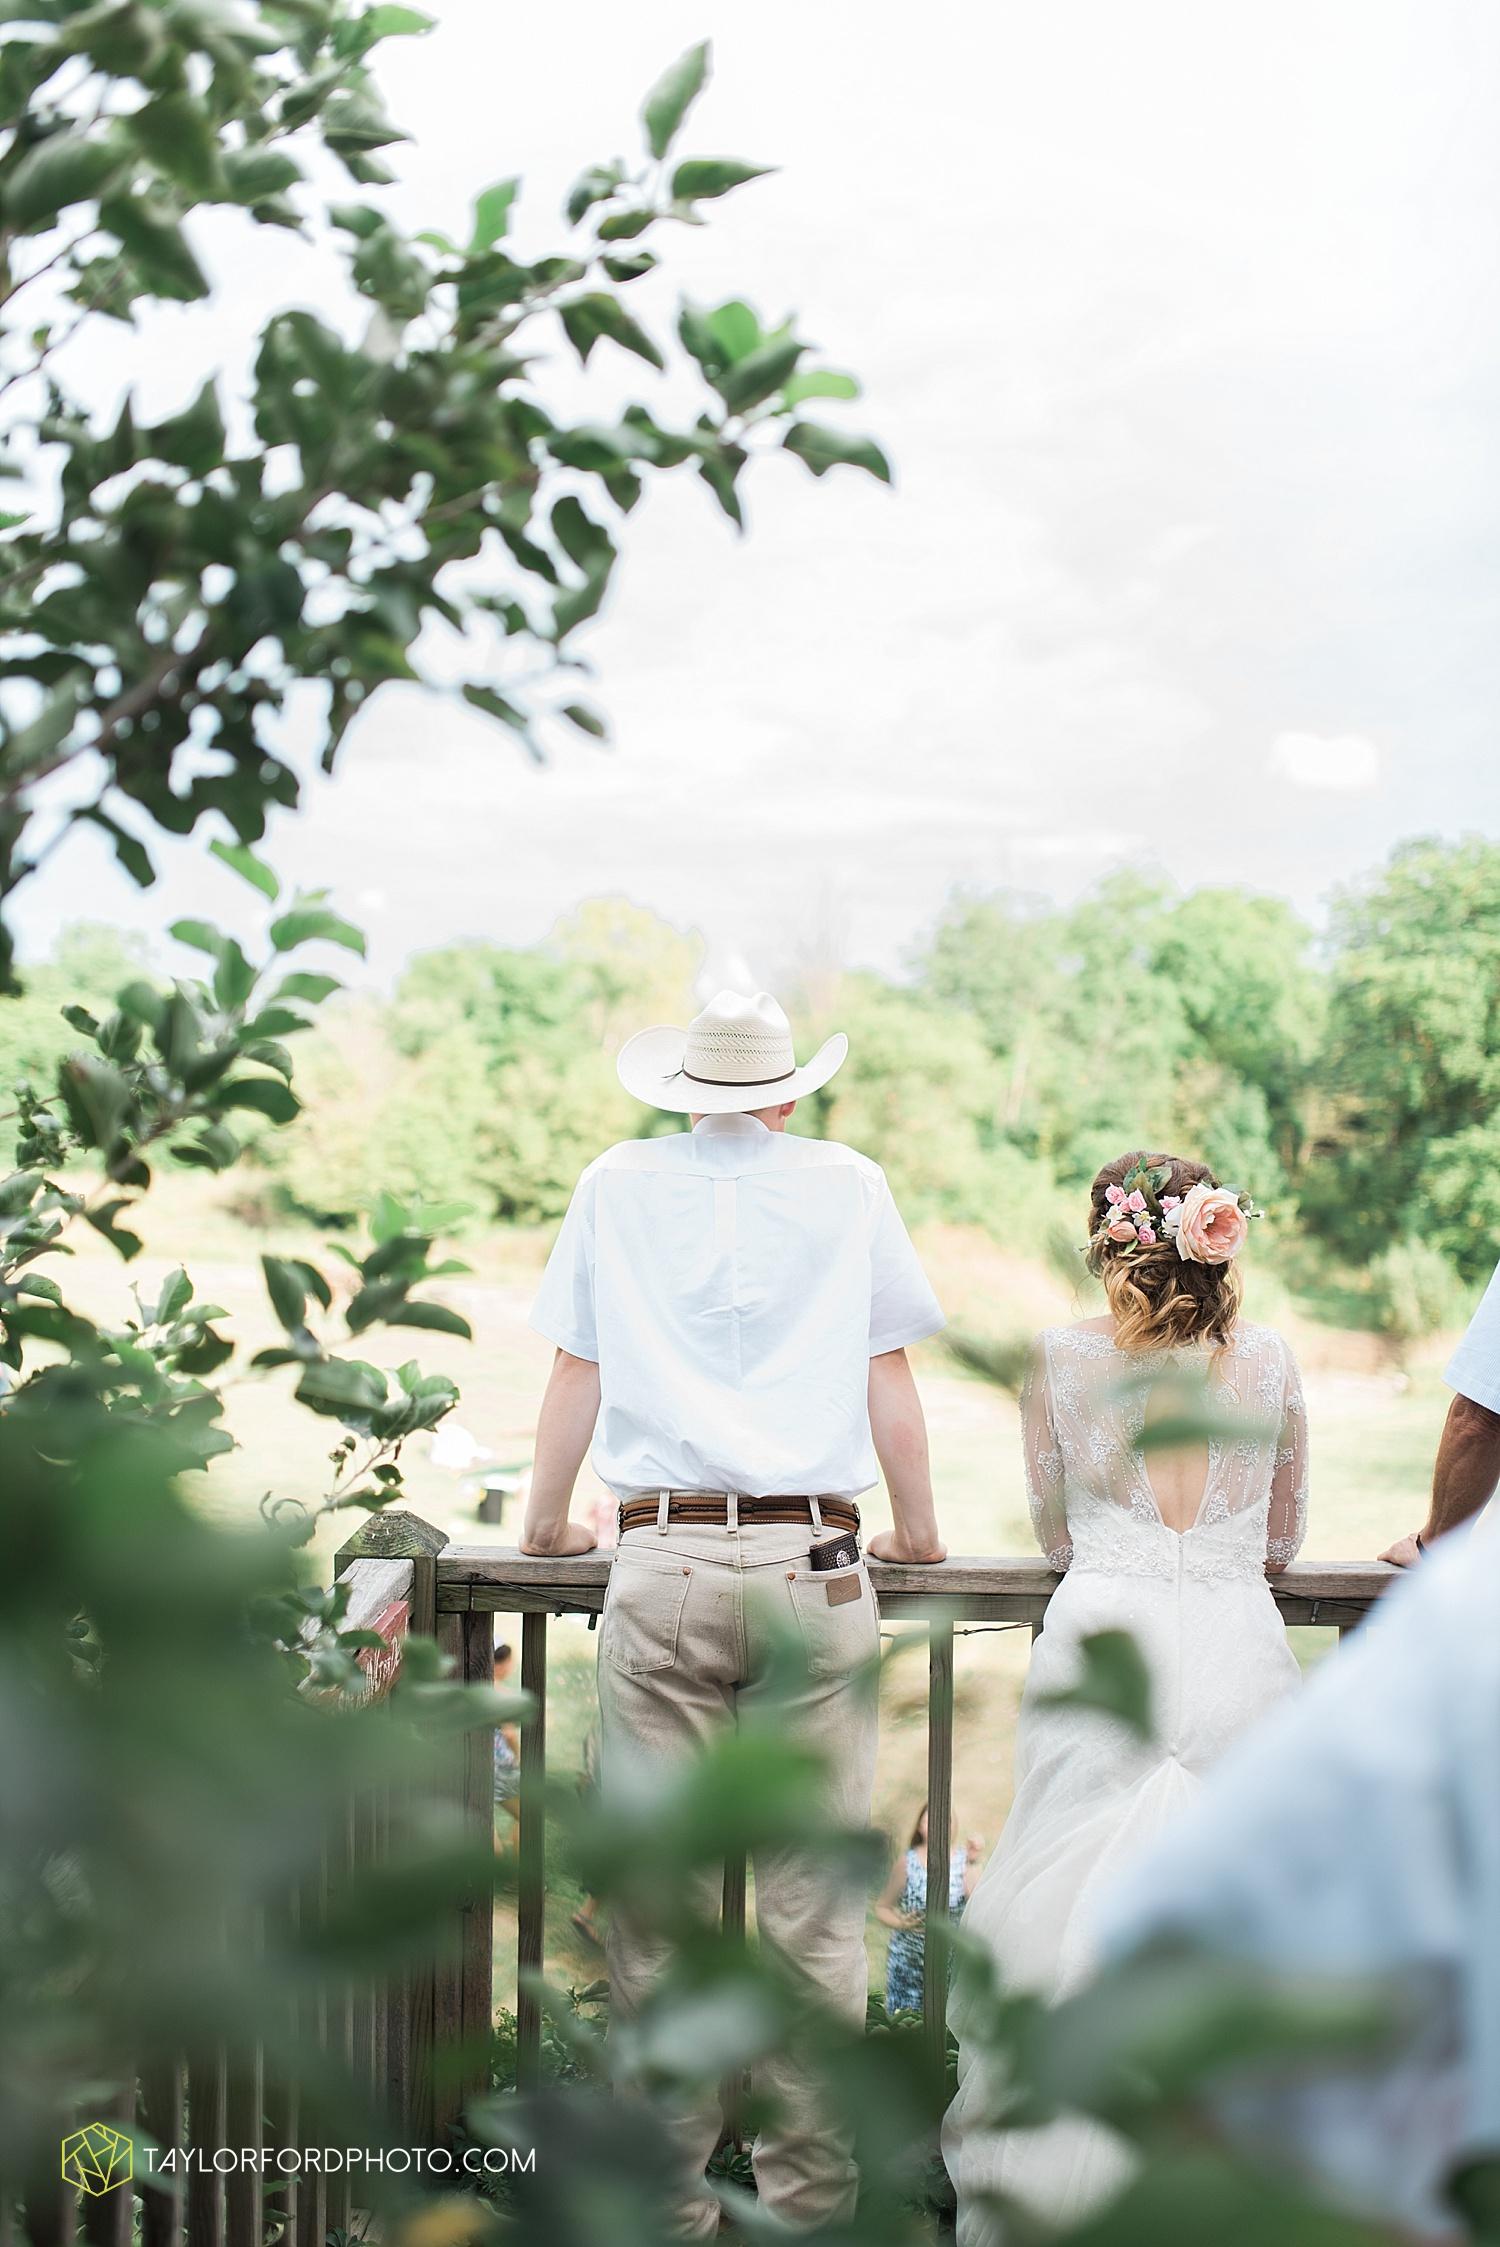 fort_wayne_indiana_wedding_photographer_taylor_ford_marian_hills_farm_0312.jpg